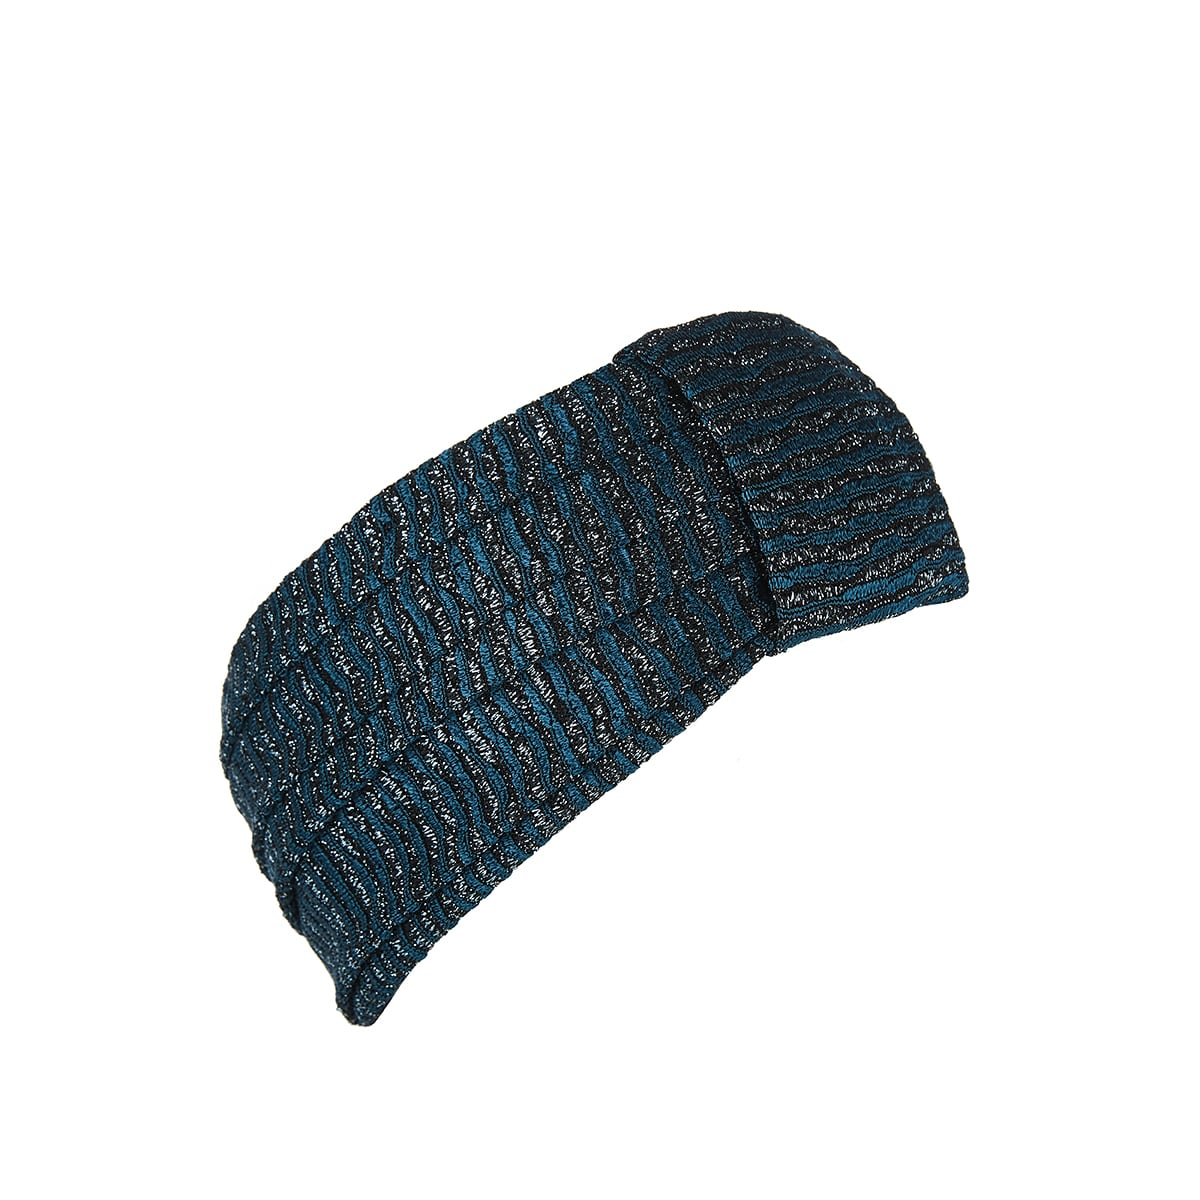 Lurex knitted headband